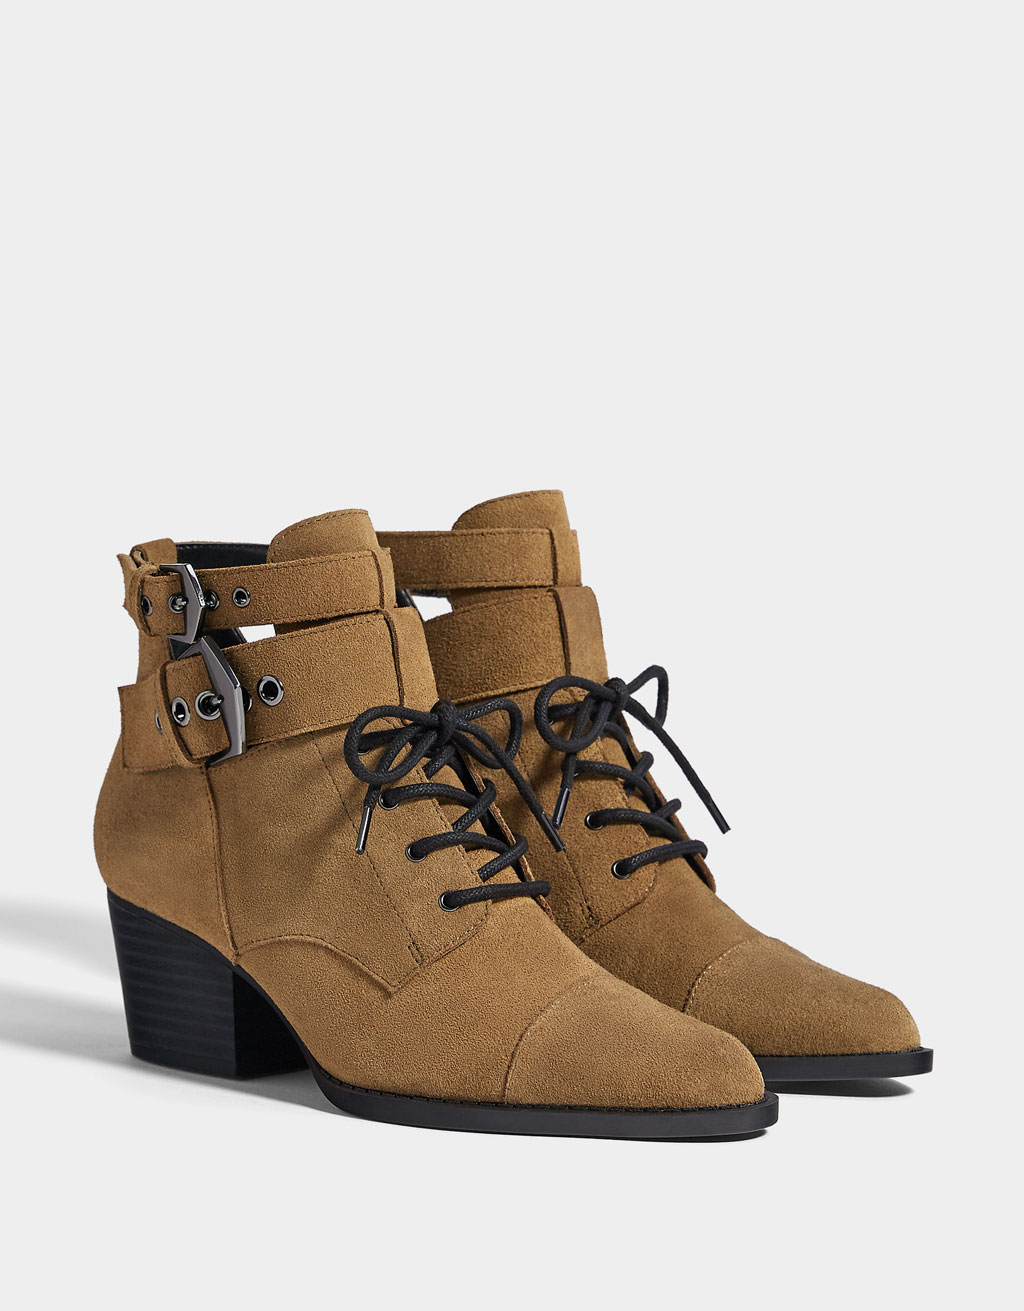 c61746d1adf Compra botas-botines online mujer